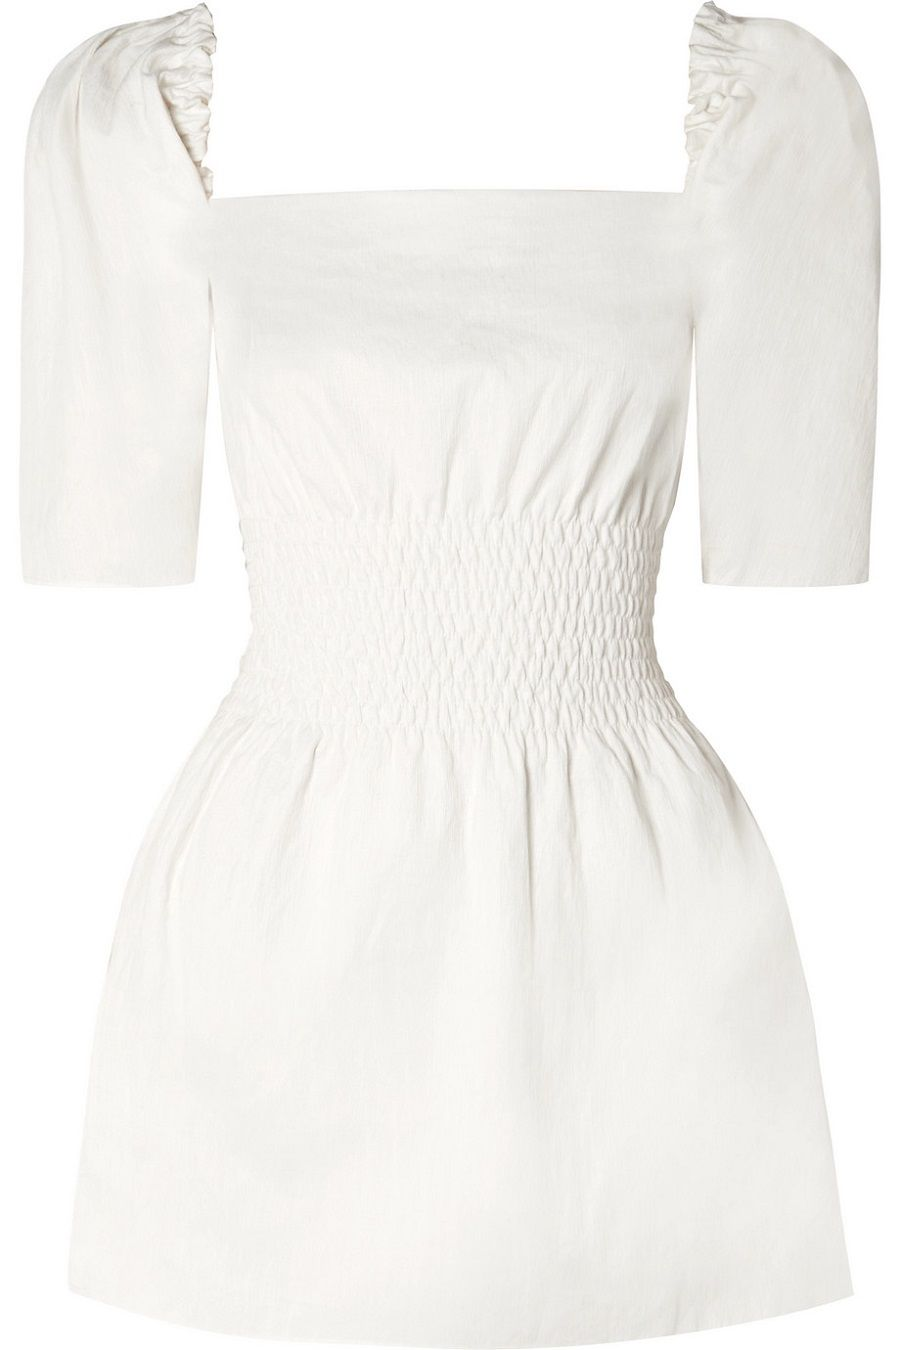 Pilihan Dress Putih Santai untuk Dikenakan Sehari-hari